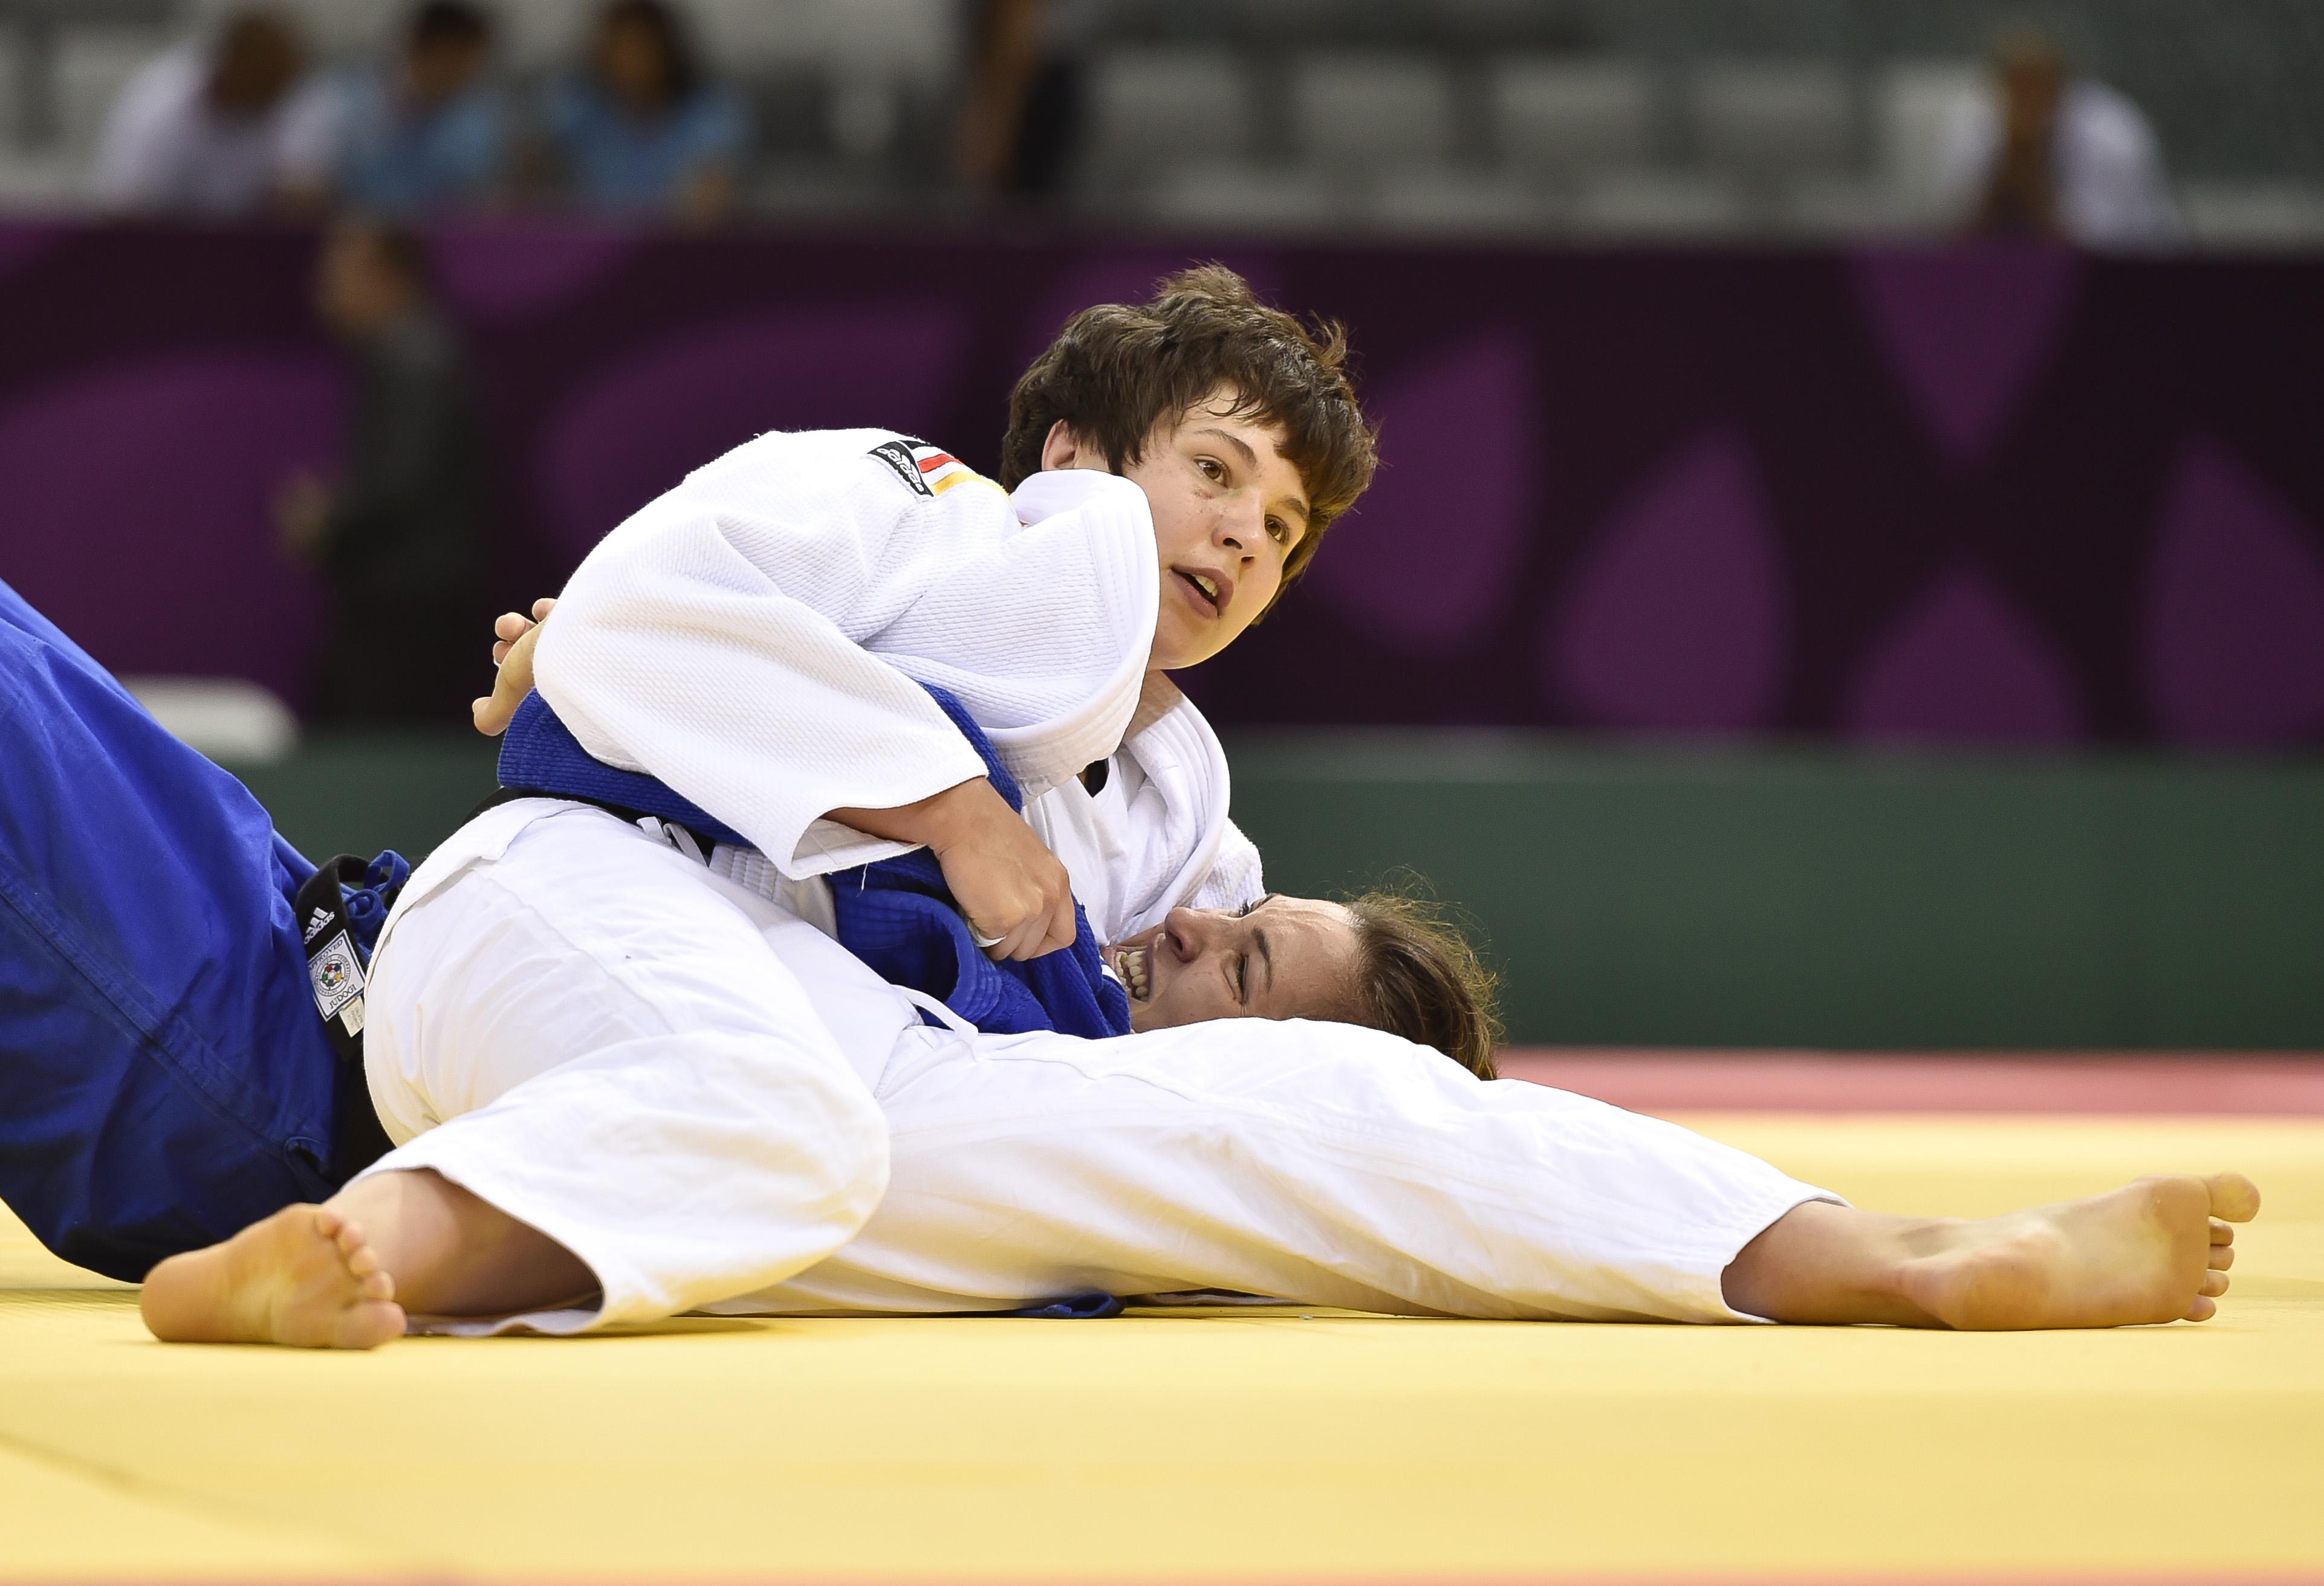 BAKU,AZERBAIJAN,24.JUN.15 - European Games Baku,Judo women-70kg. Image shows Laura Vargas Koch (GER) and Lior Wildikan (ISR). |